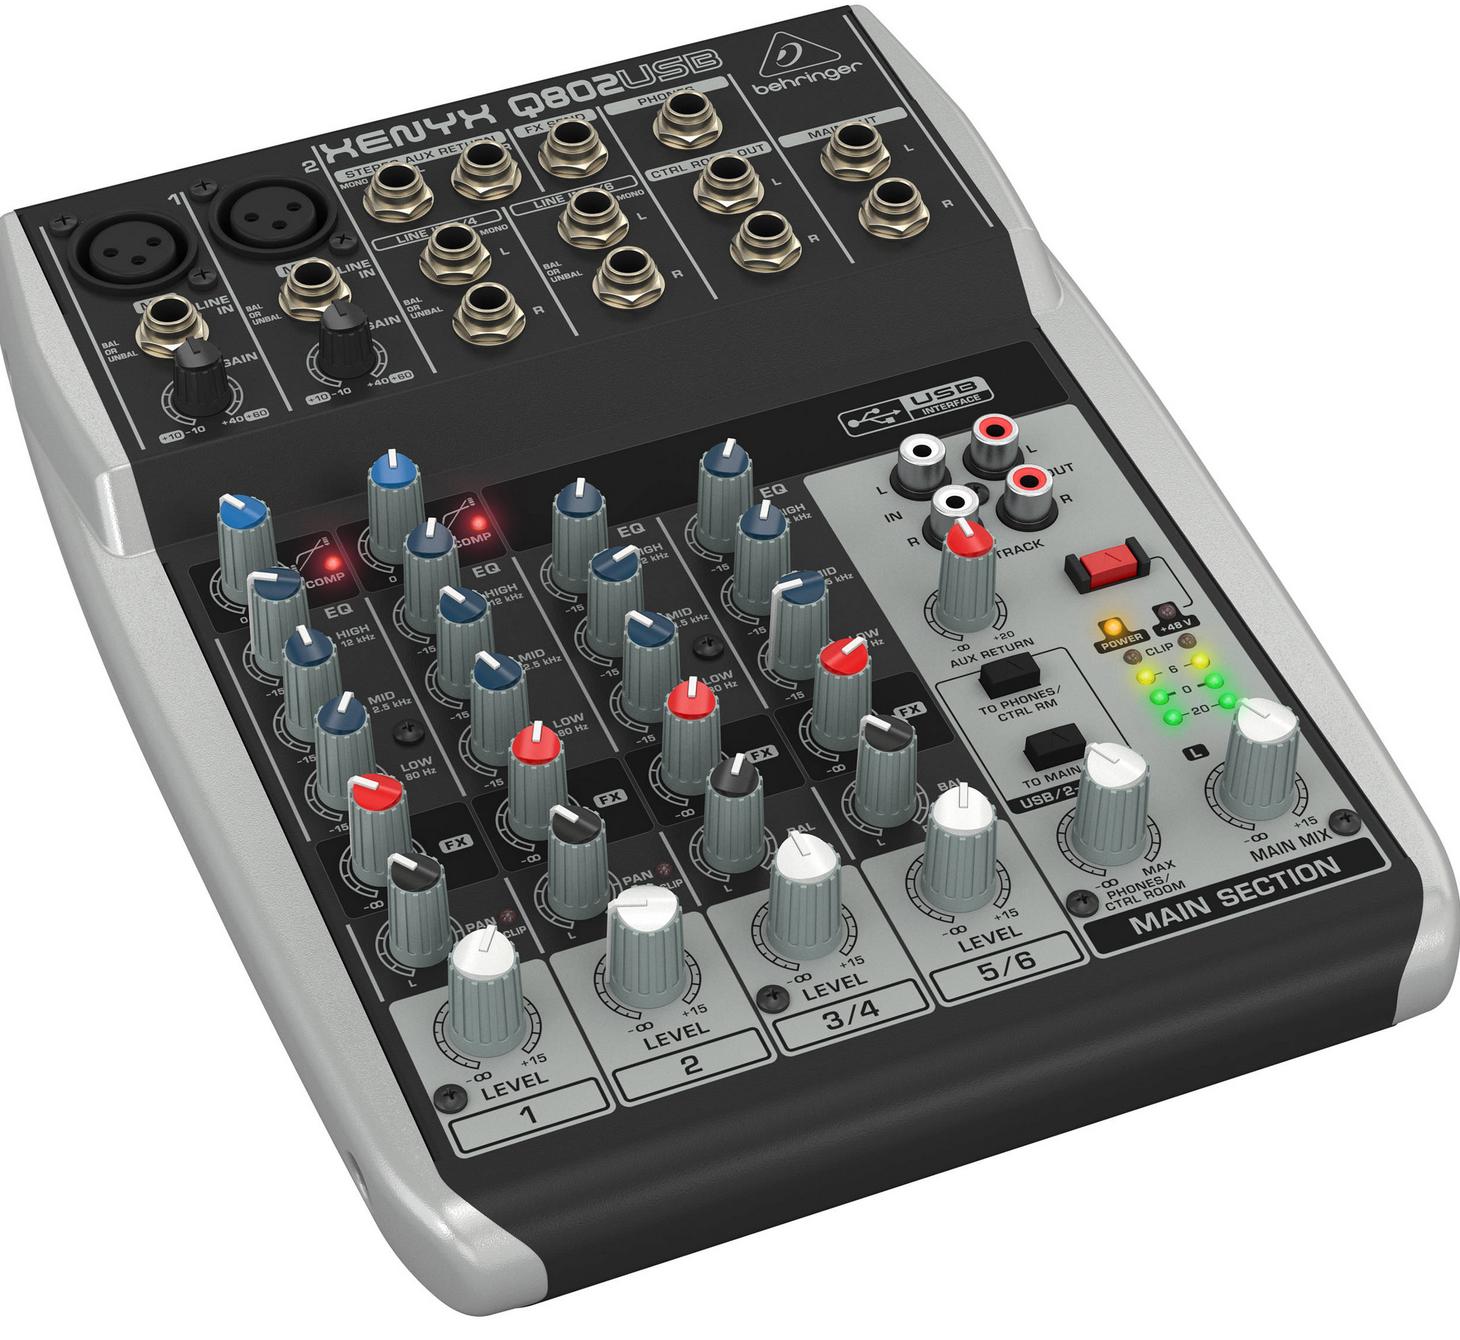 Behringer 802 8-Input 2-Bus Mixer XENYX/EQ